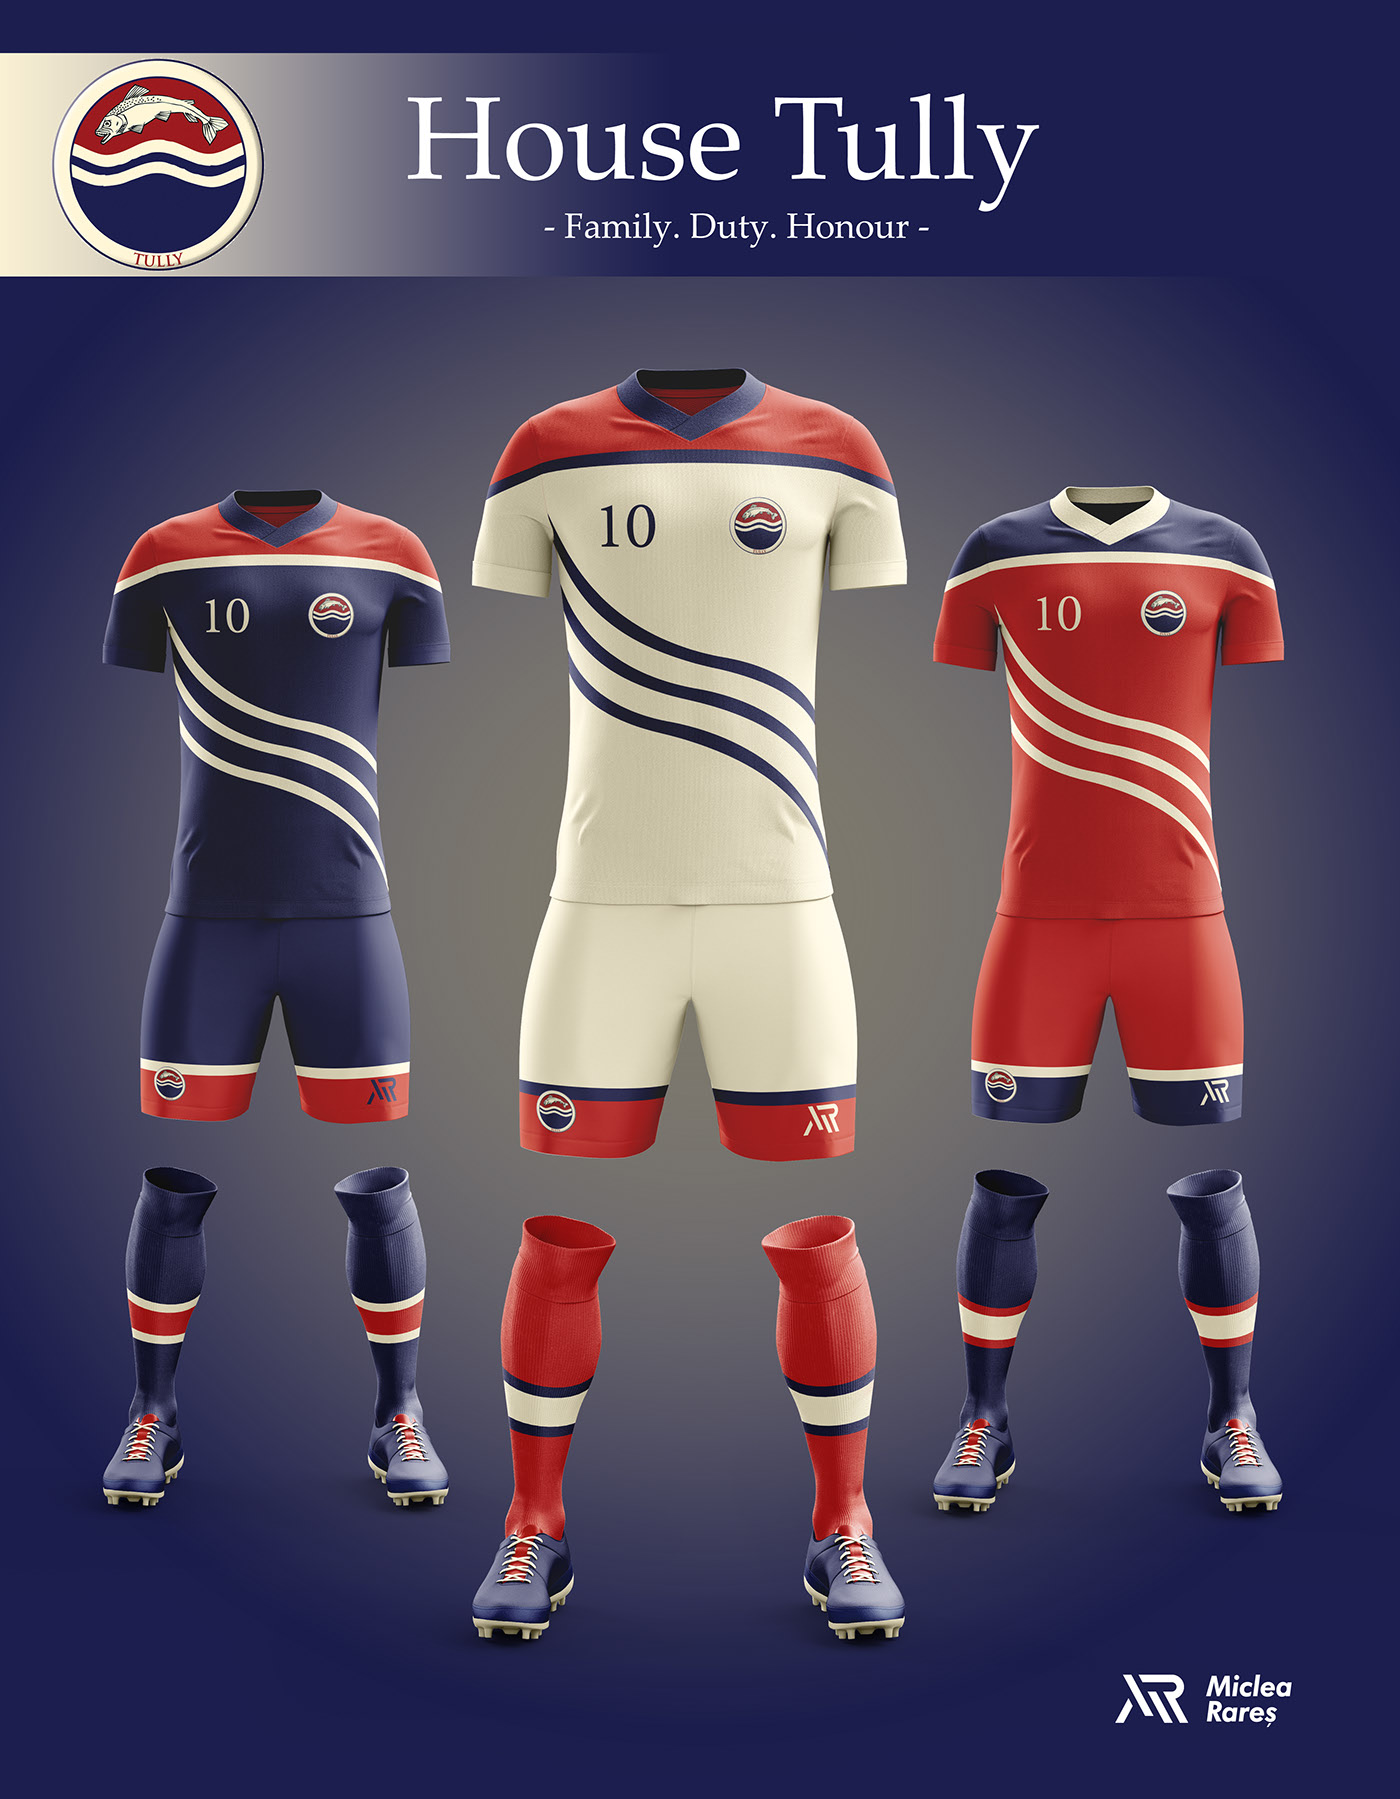 House Tully Football Kit